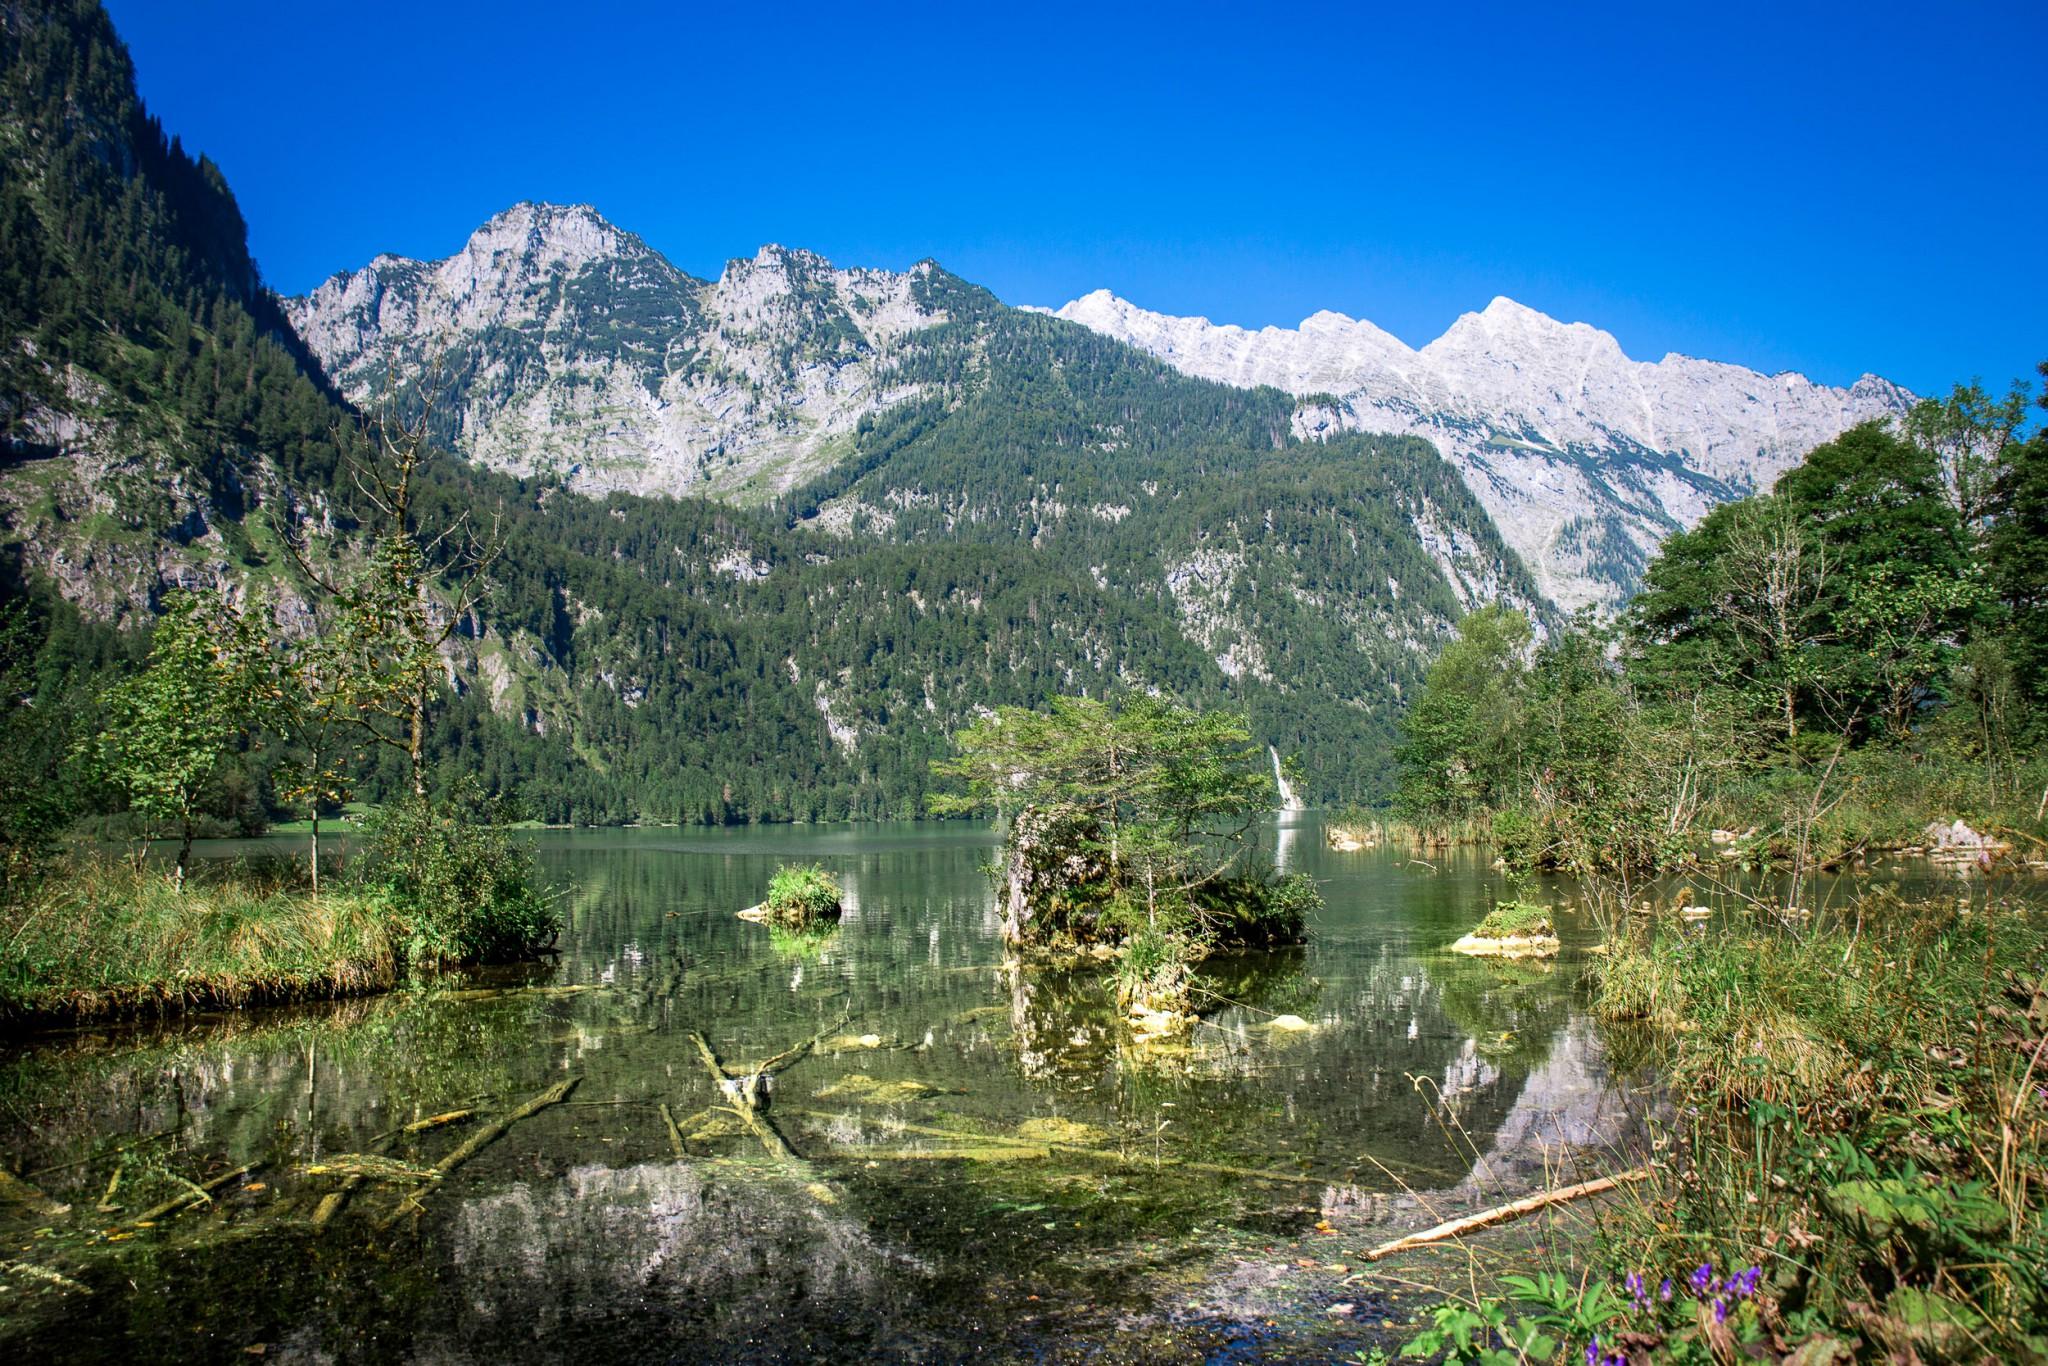 koenigsee_obersee_schoengau_berchdesgadener_land_k4a8025